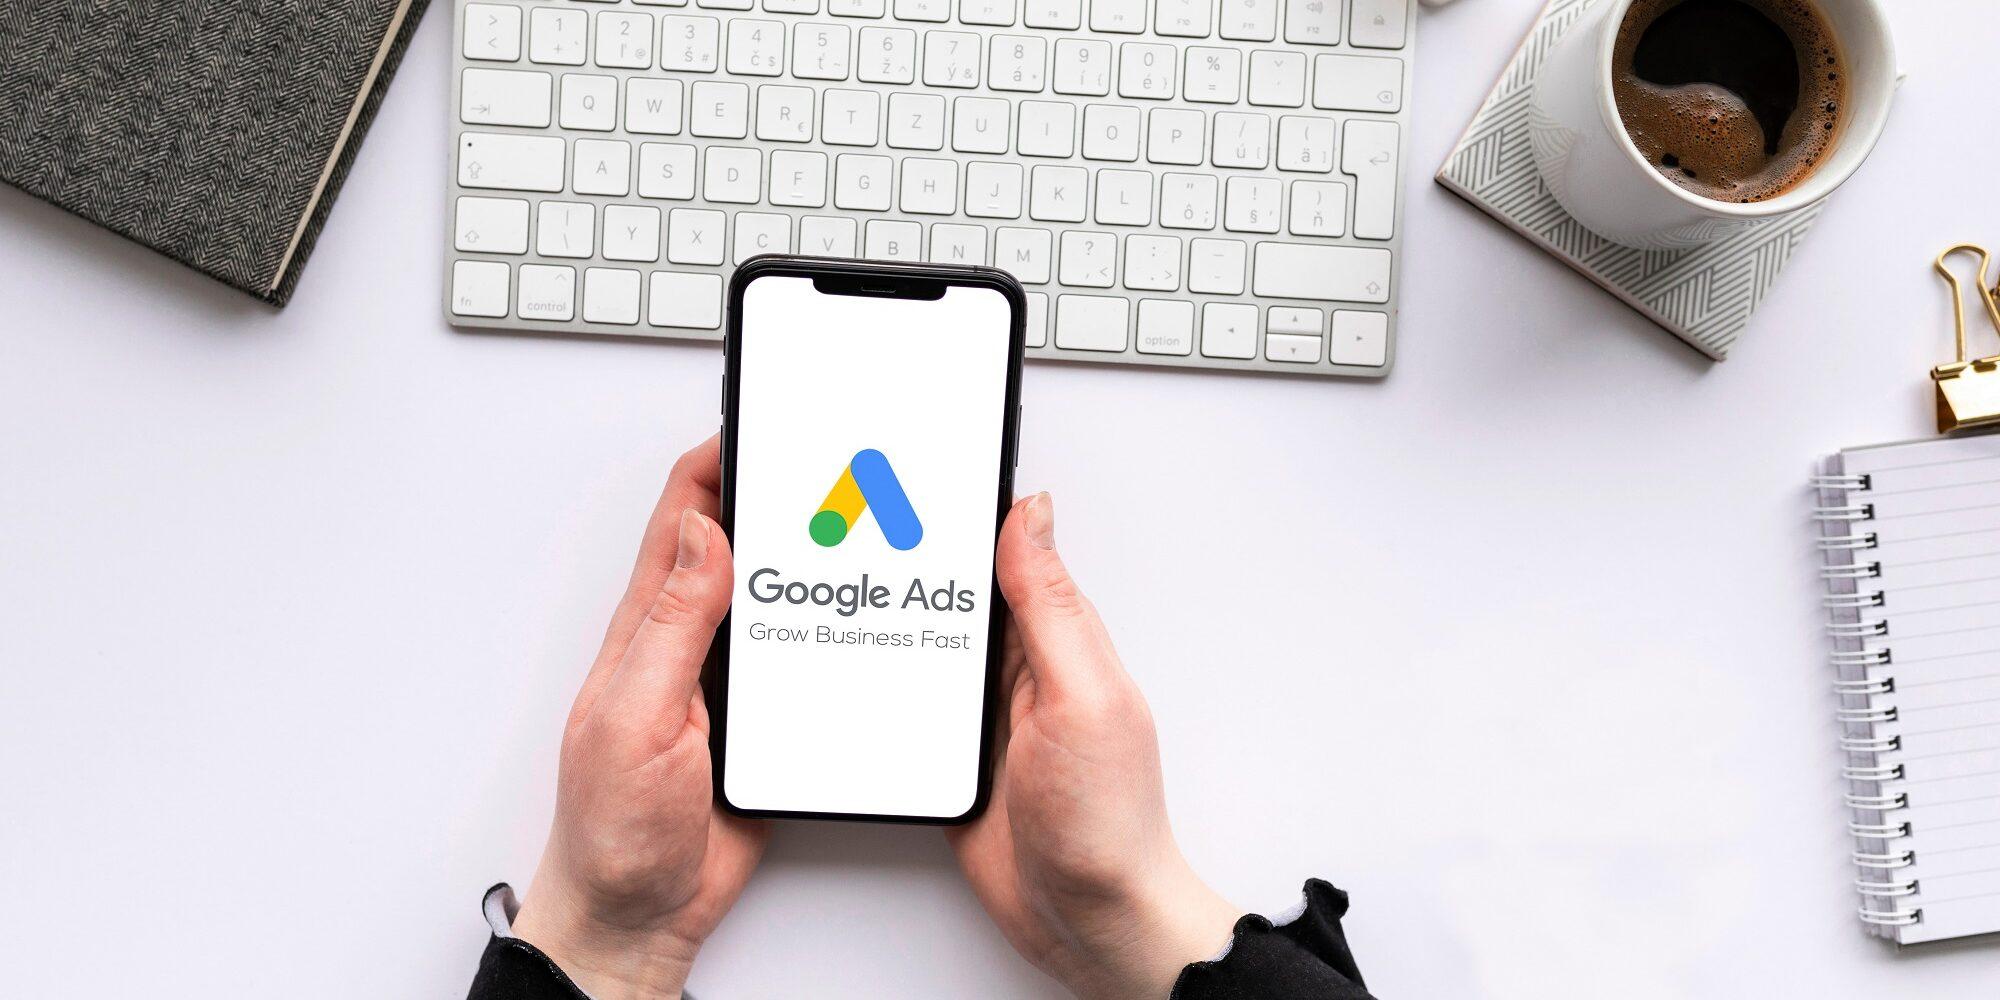 Google Ads keyword matching